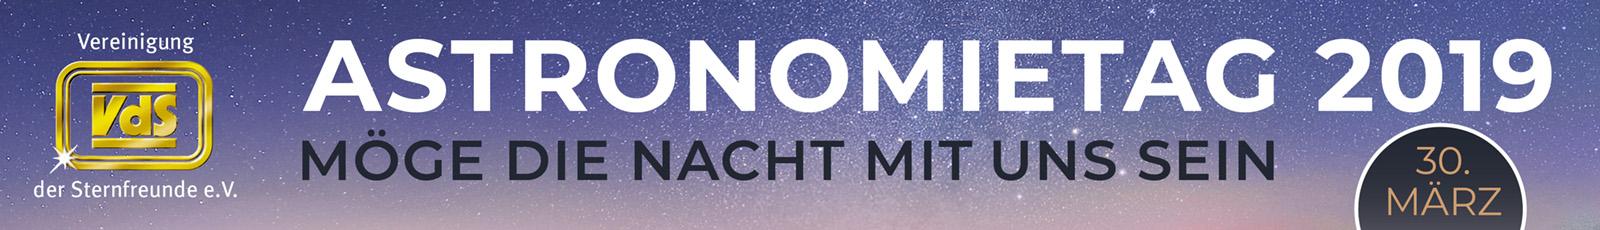 Banner Astronomietag 2019